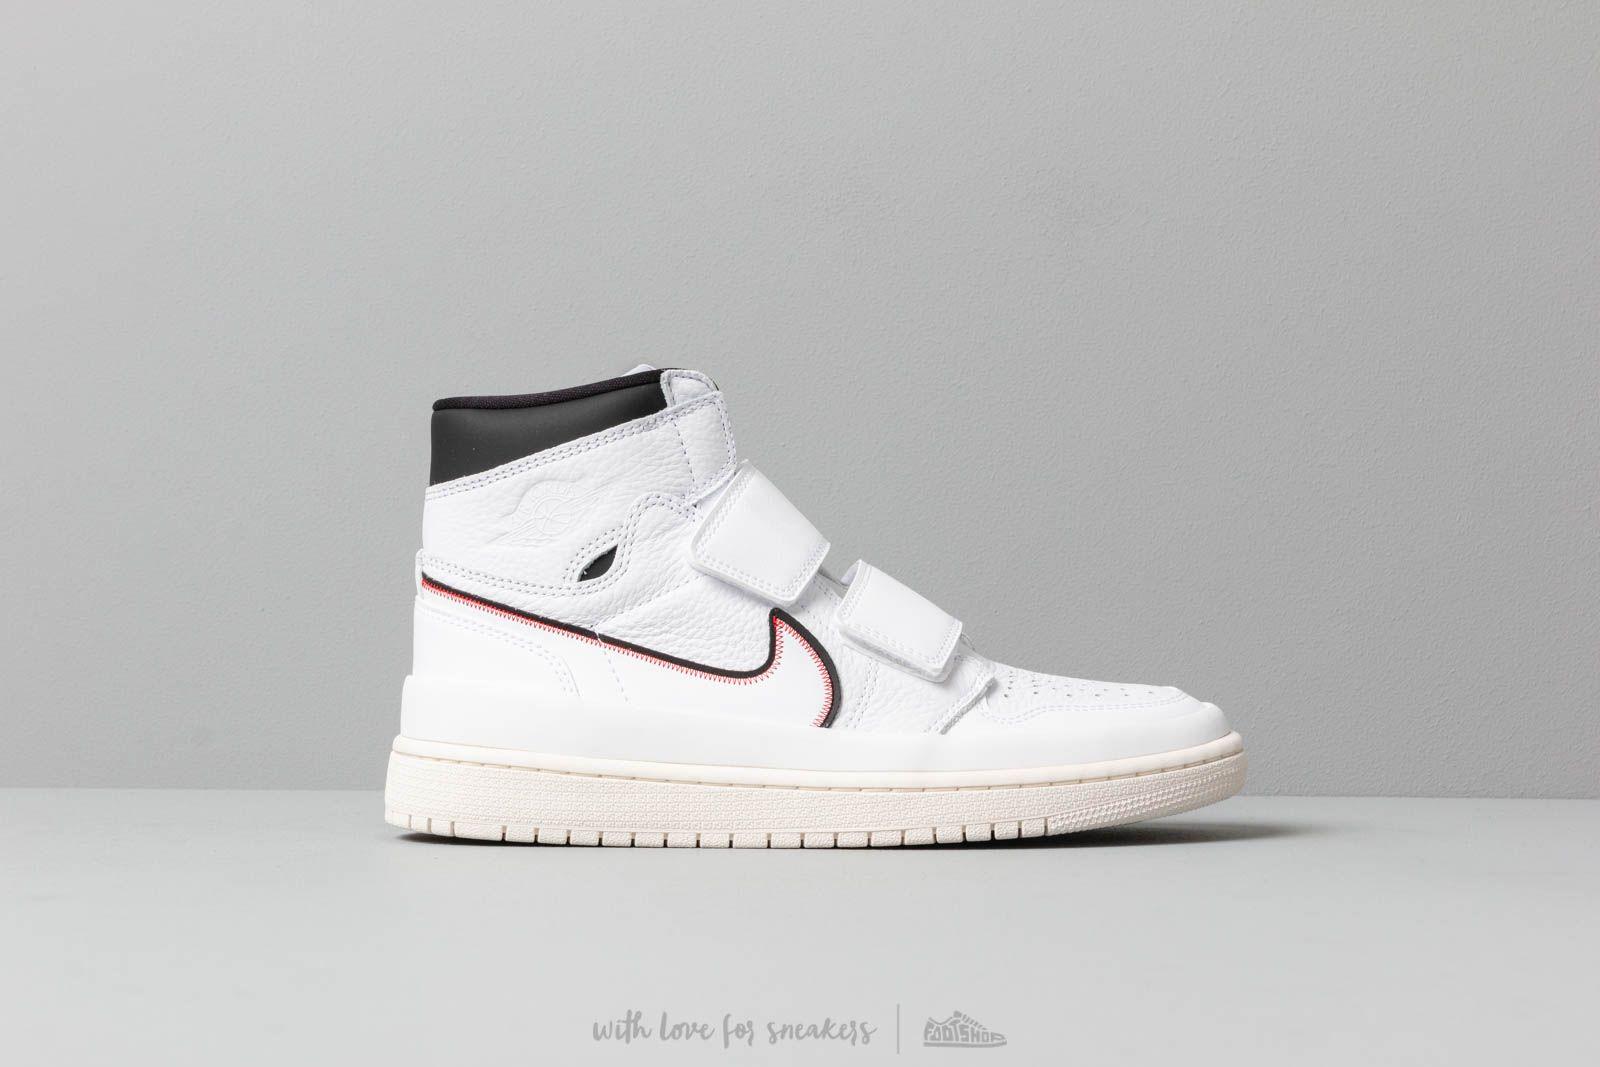 Air Jordan 1 Re Hi Double Strap White White Black Sail   Footshop